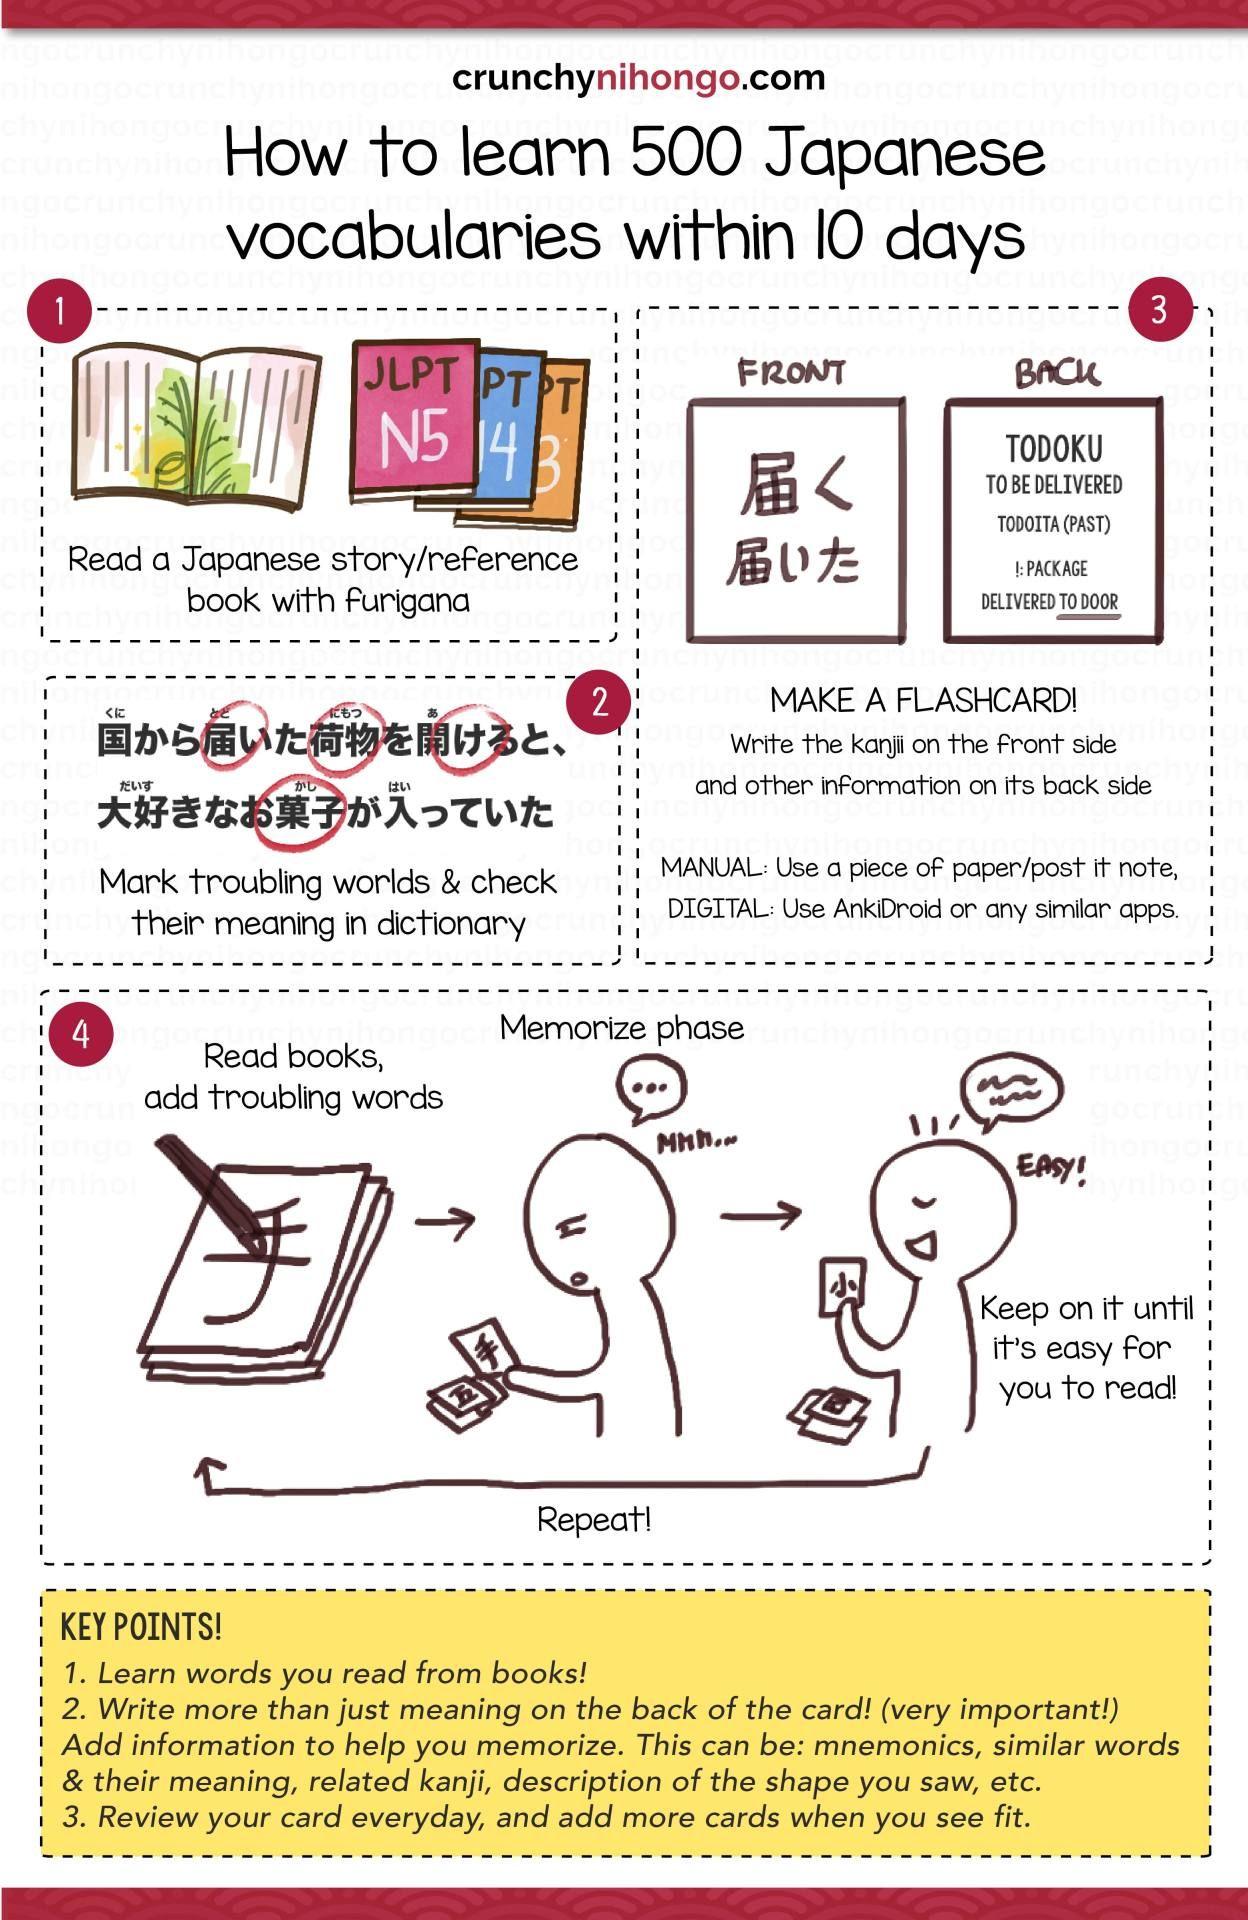 How To Improve Your Japanese Kanji Vocabulary Skills 500 Words 10 Days Urgh Flashcard Japanese Language Learning Japanese Language Learn Japanese Words